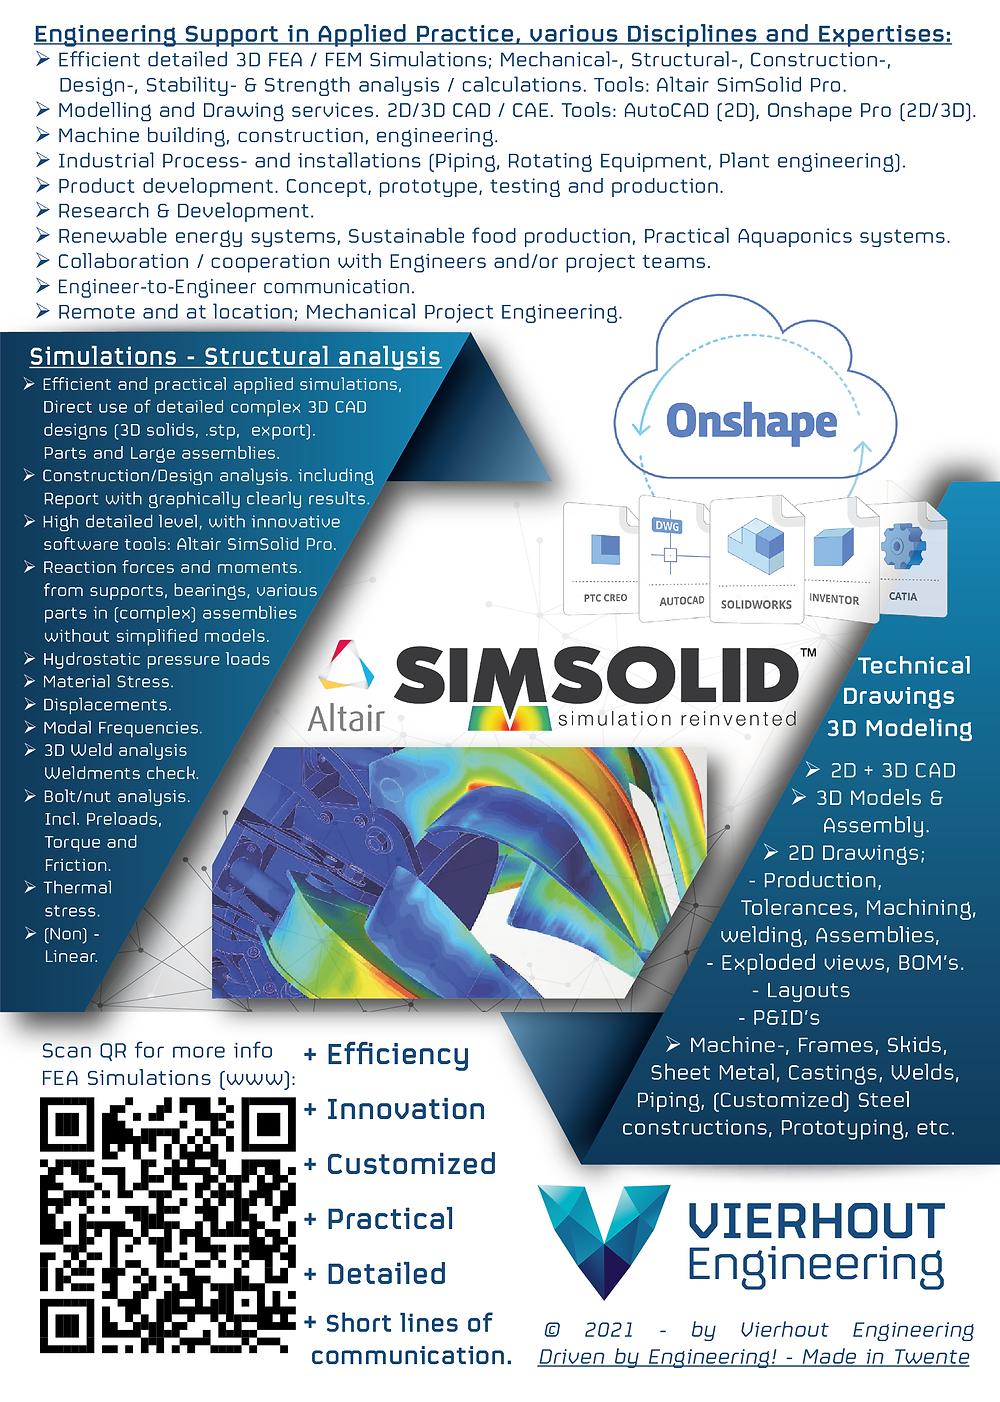 Werktuigbouw, Sterkteberekening, FEA, FEM Simulatie, 3D CAD, Structural, Mechanical engineering